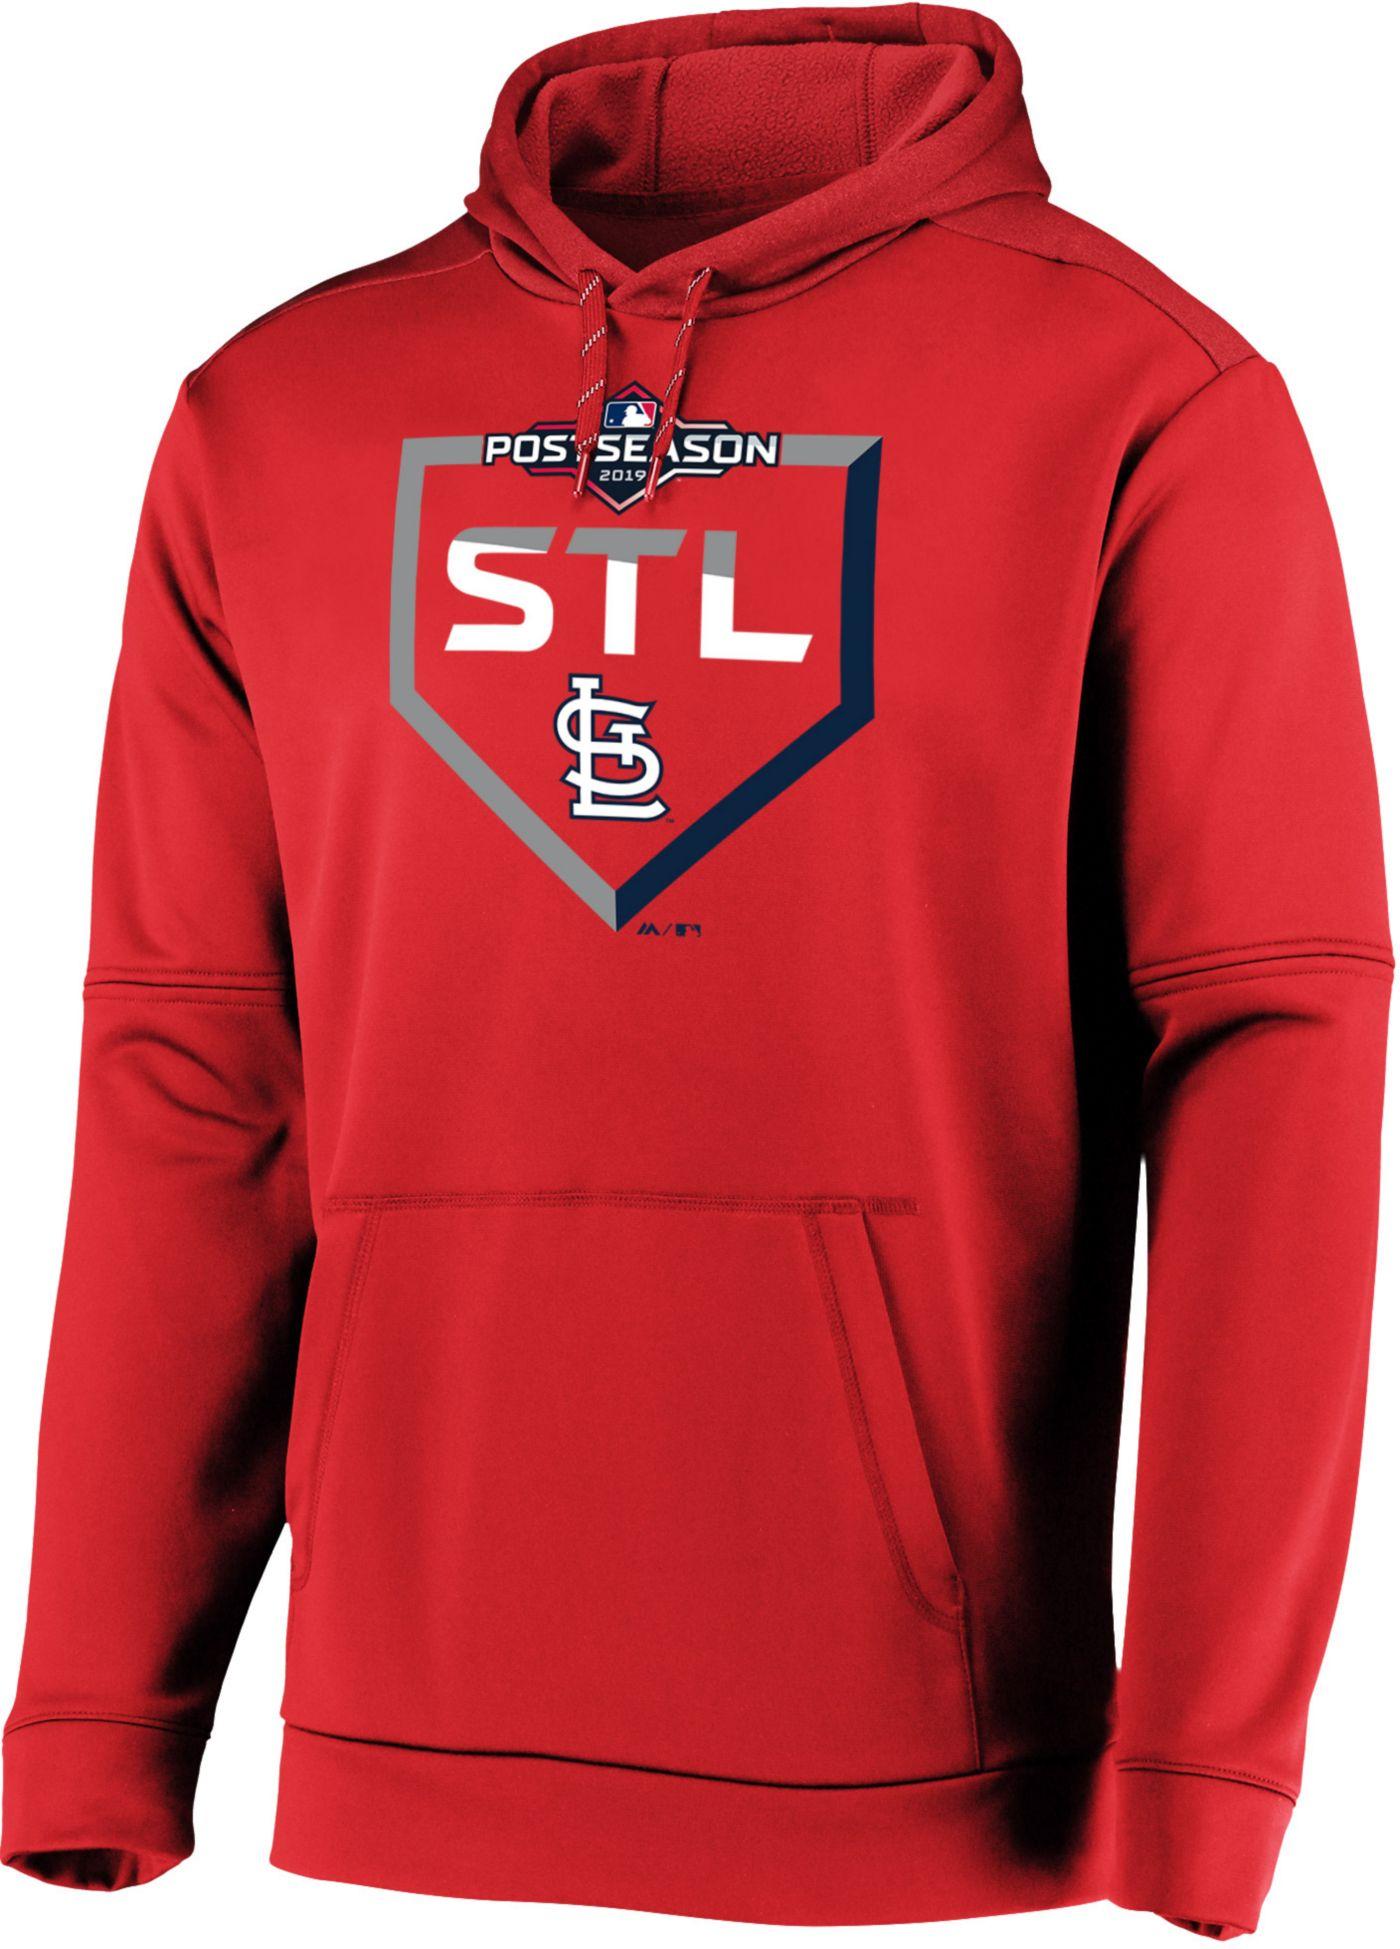 Majestic Men's St. Louis Cardinals 2019 MLB Postseason On-Field Therma Base Hoodie